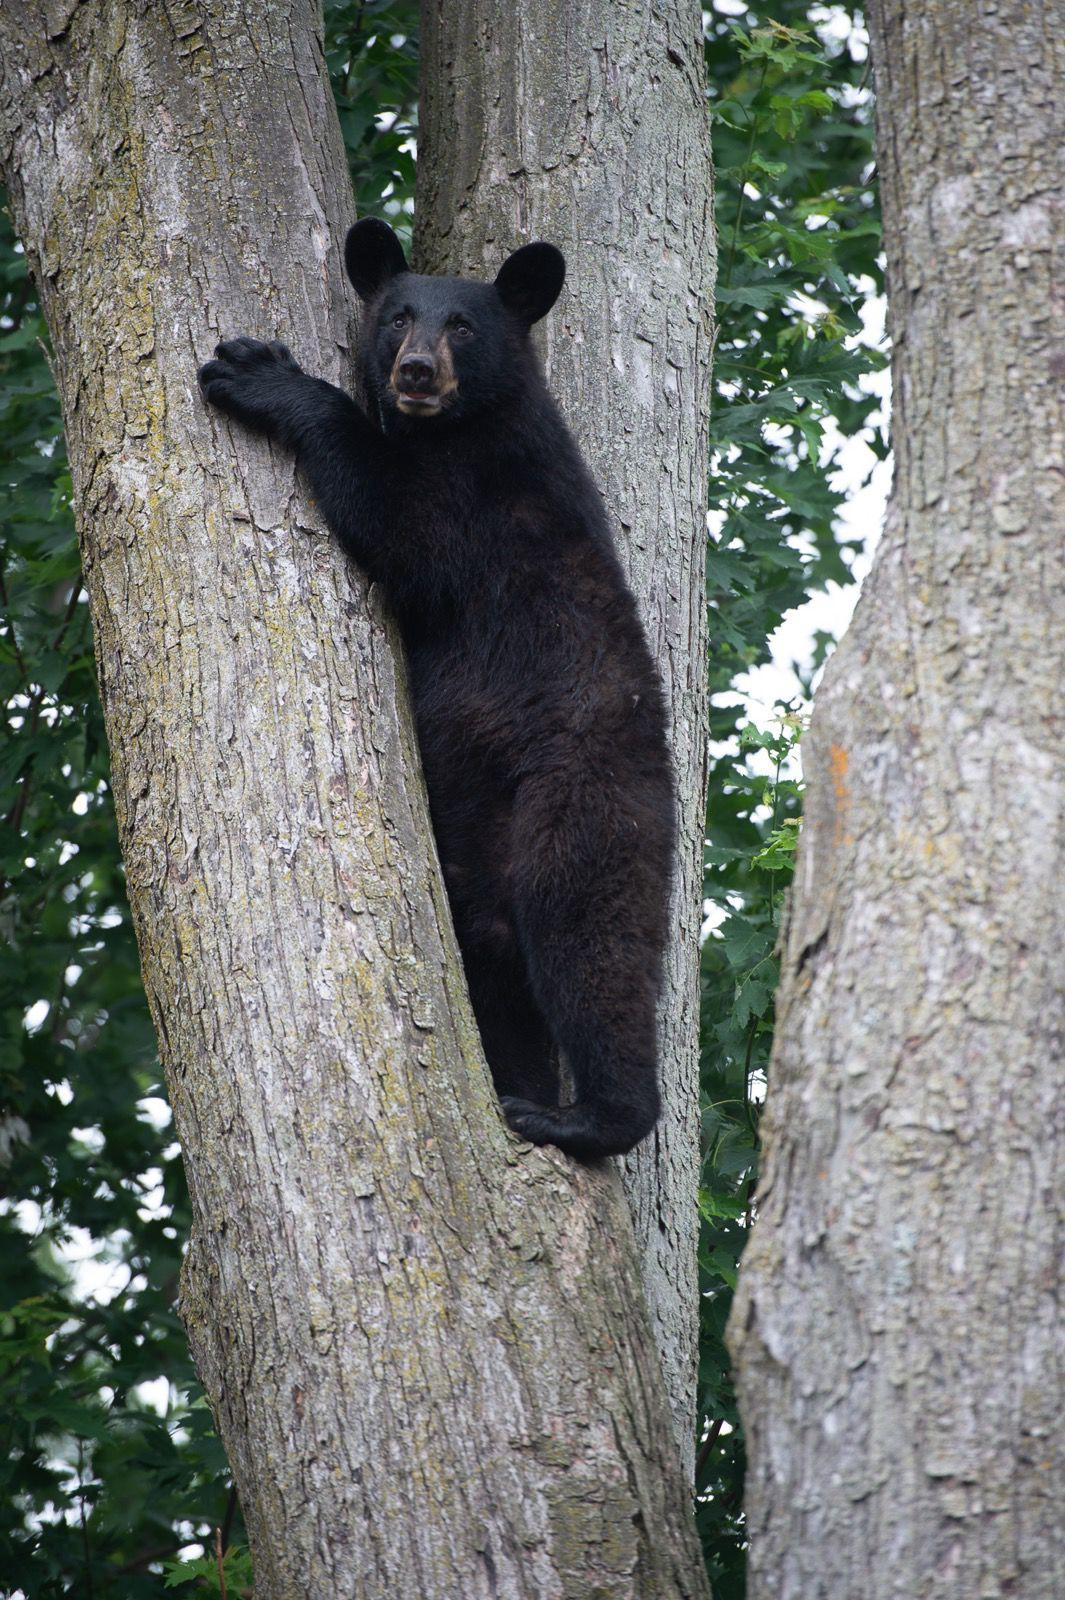 0625_wds_kie bear 2.jpg